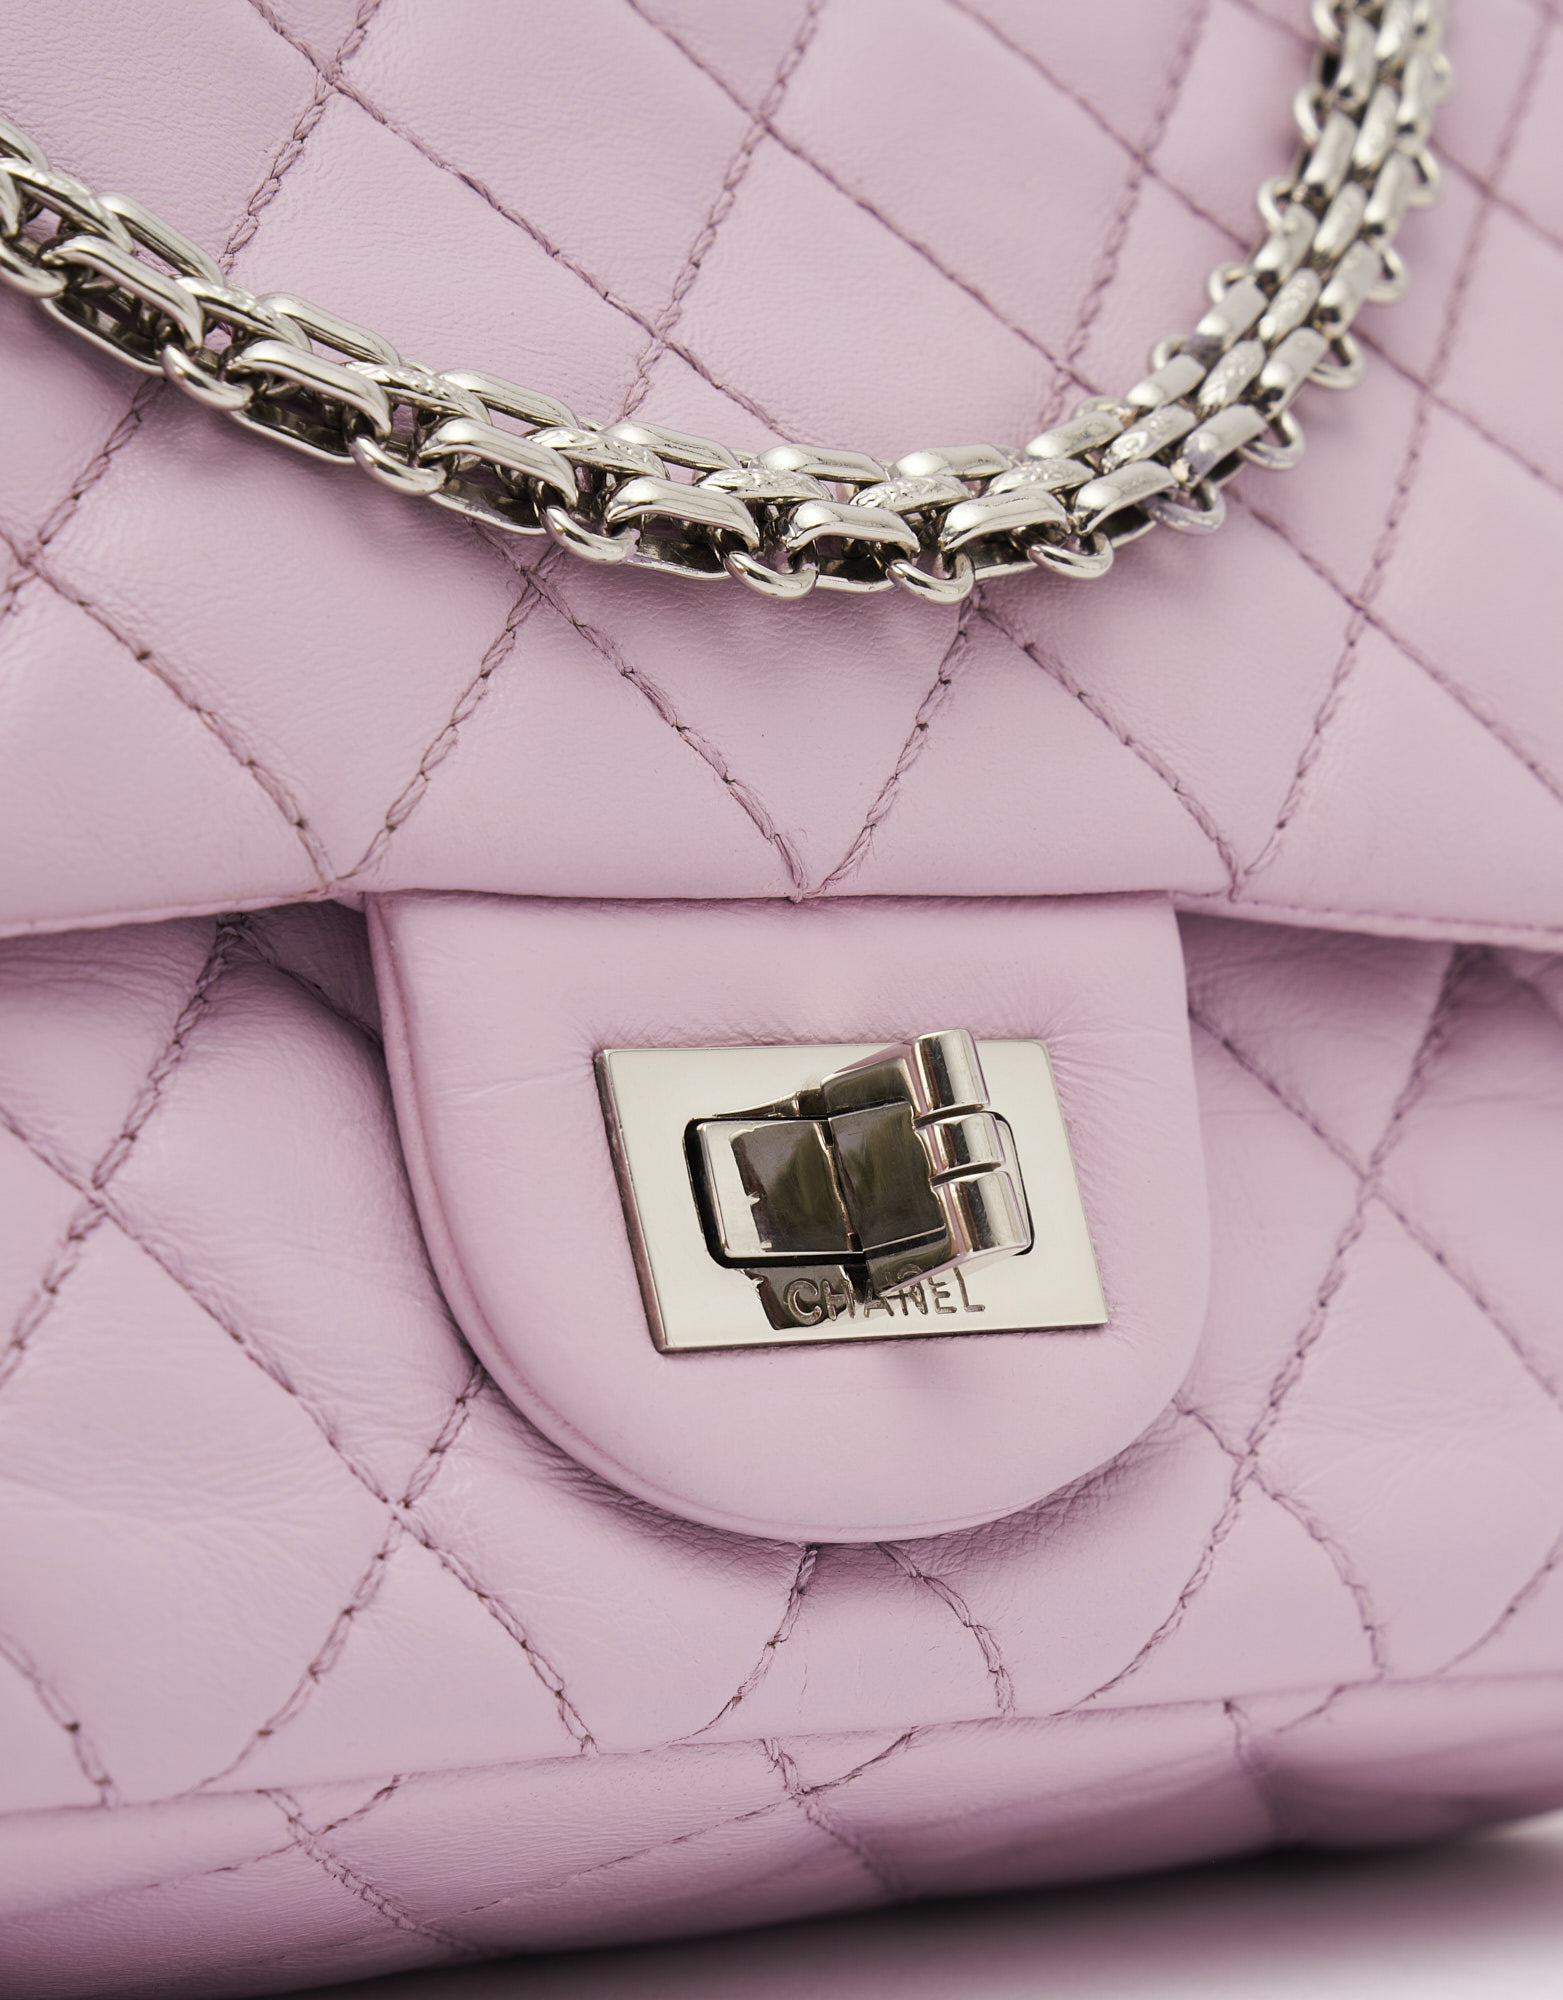 Chanel 2.55 Reissue 225 Lamb Rose Handbag Silver Mademoiselle Lock